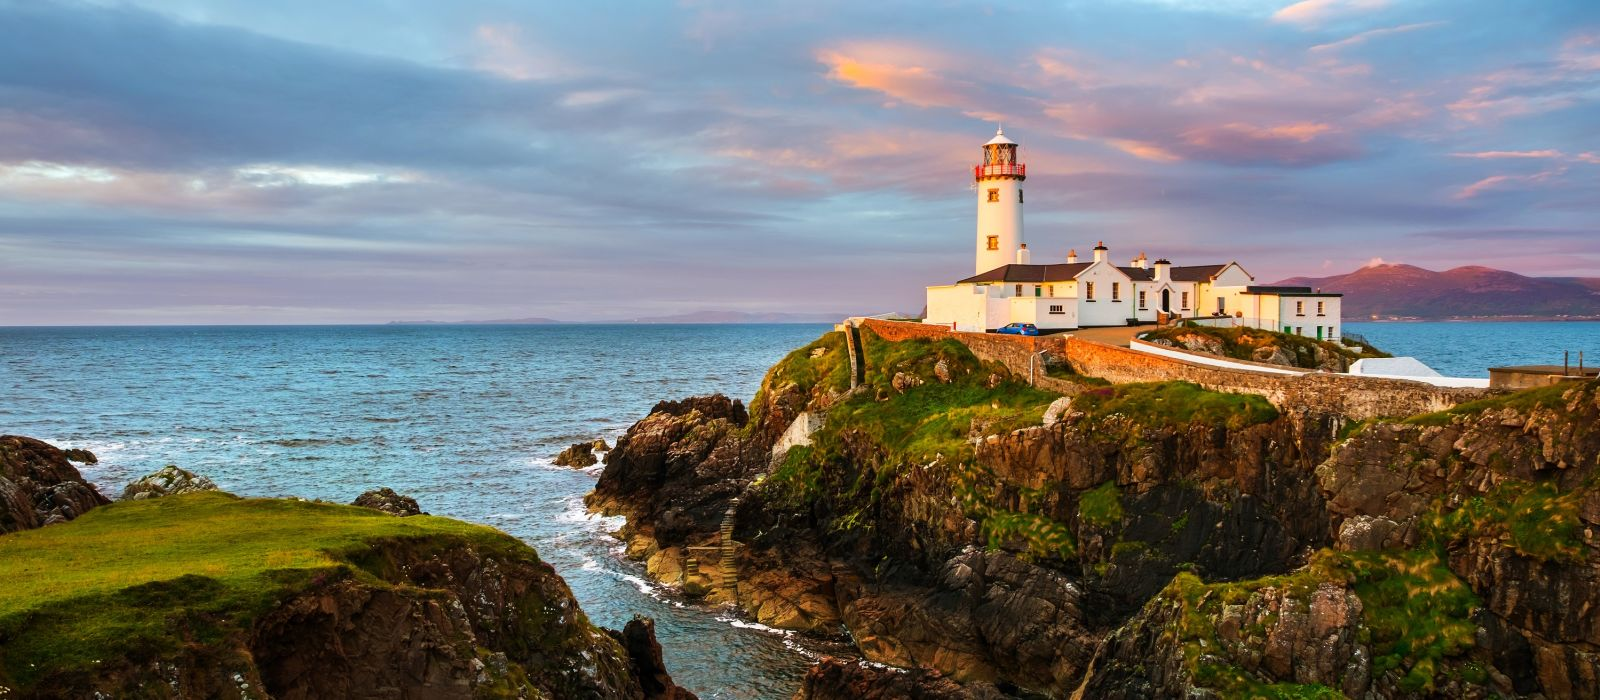 Destination Donegal UK & Ireland